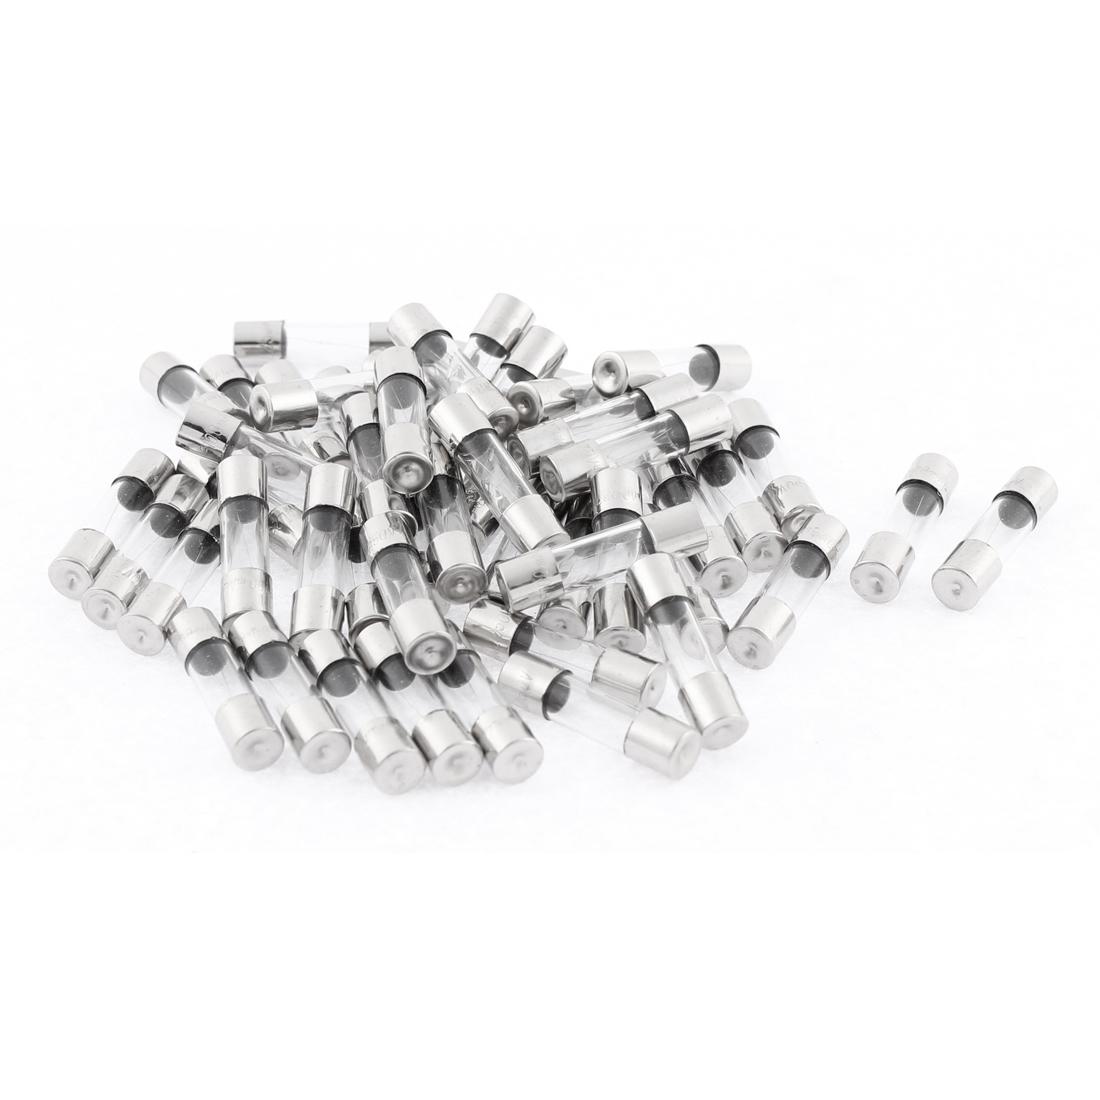 250V 0.1A Fast Quick Blow Glass Fuses 5 x 20mm 50Pcs